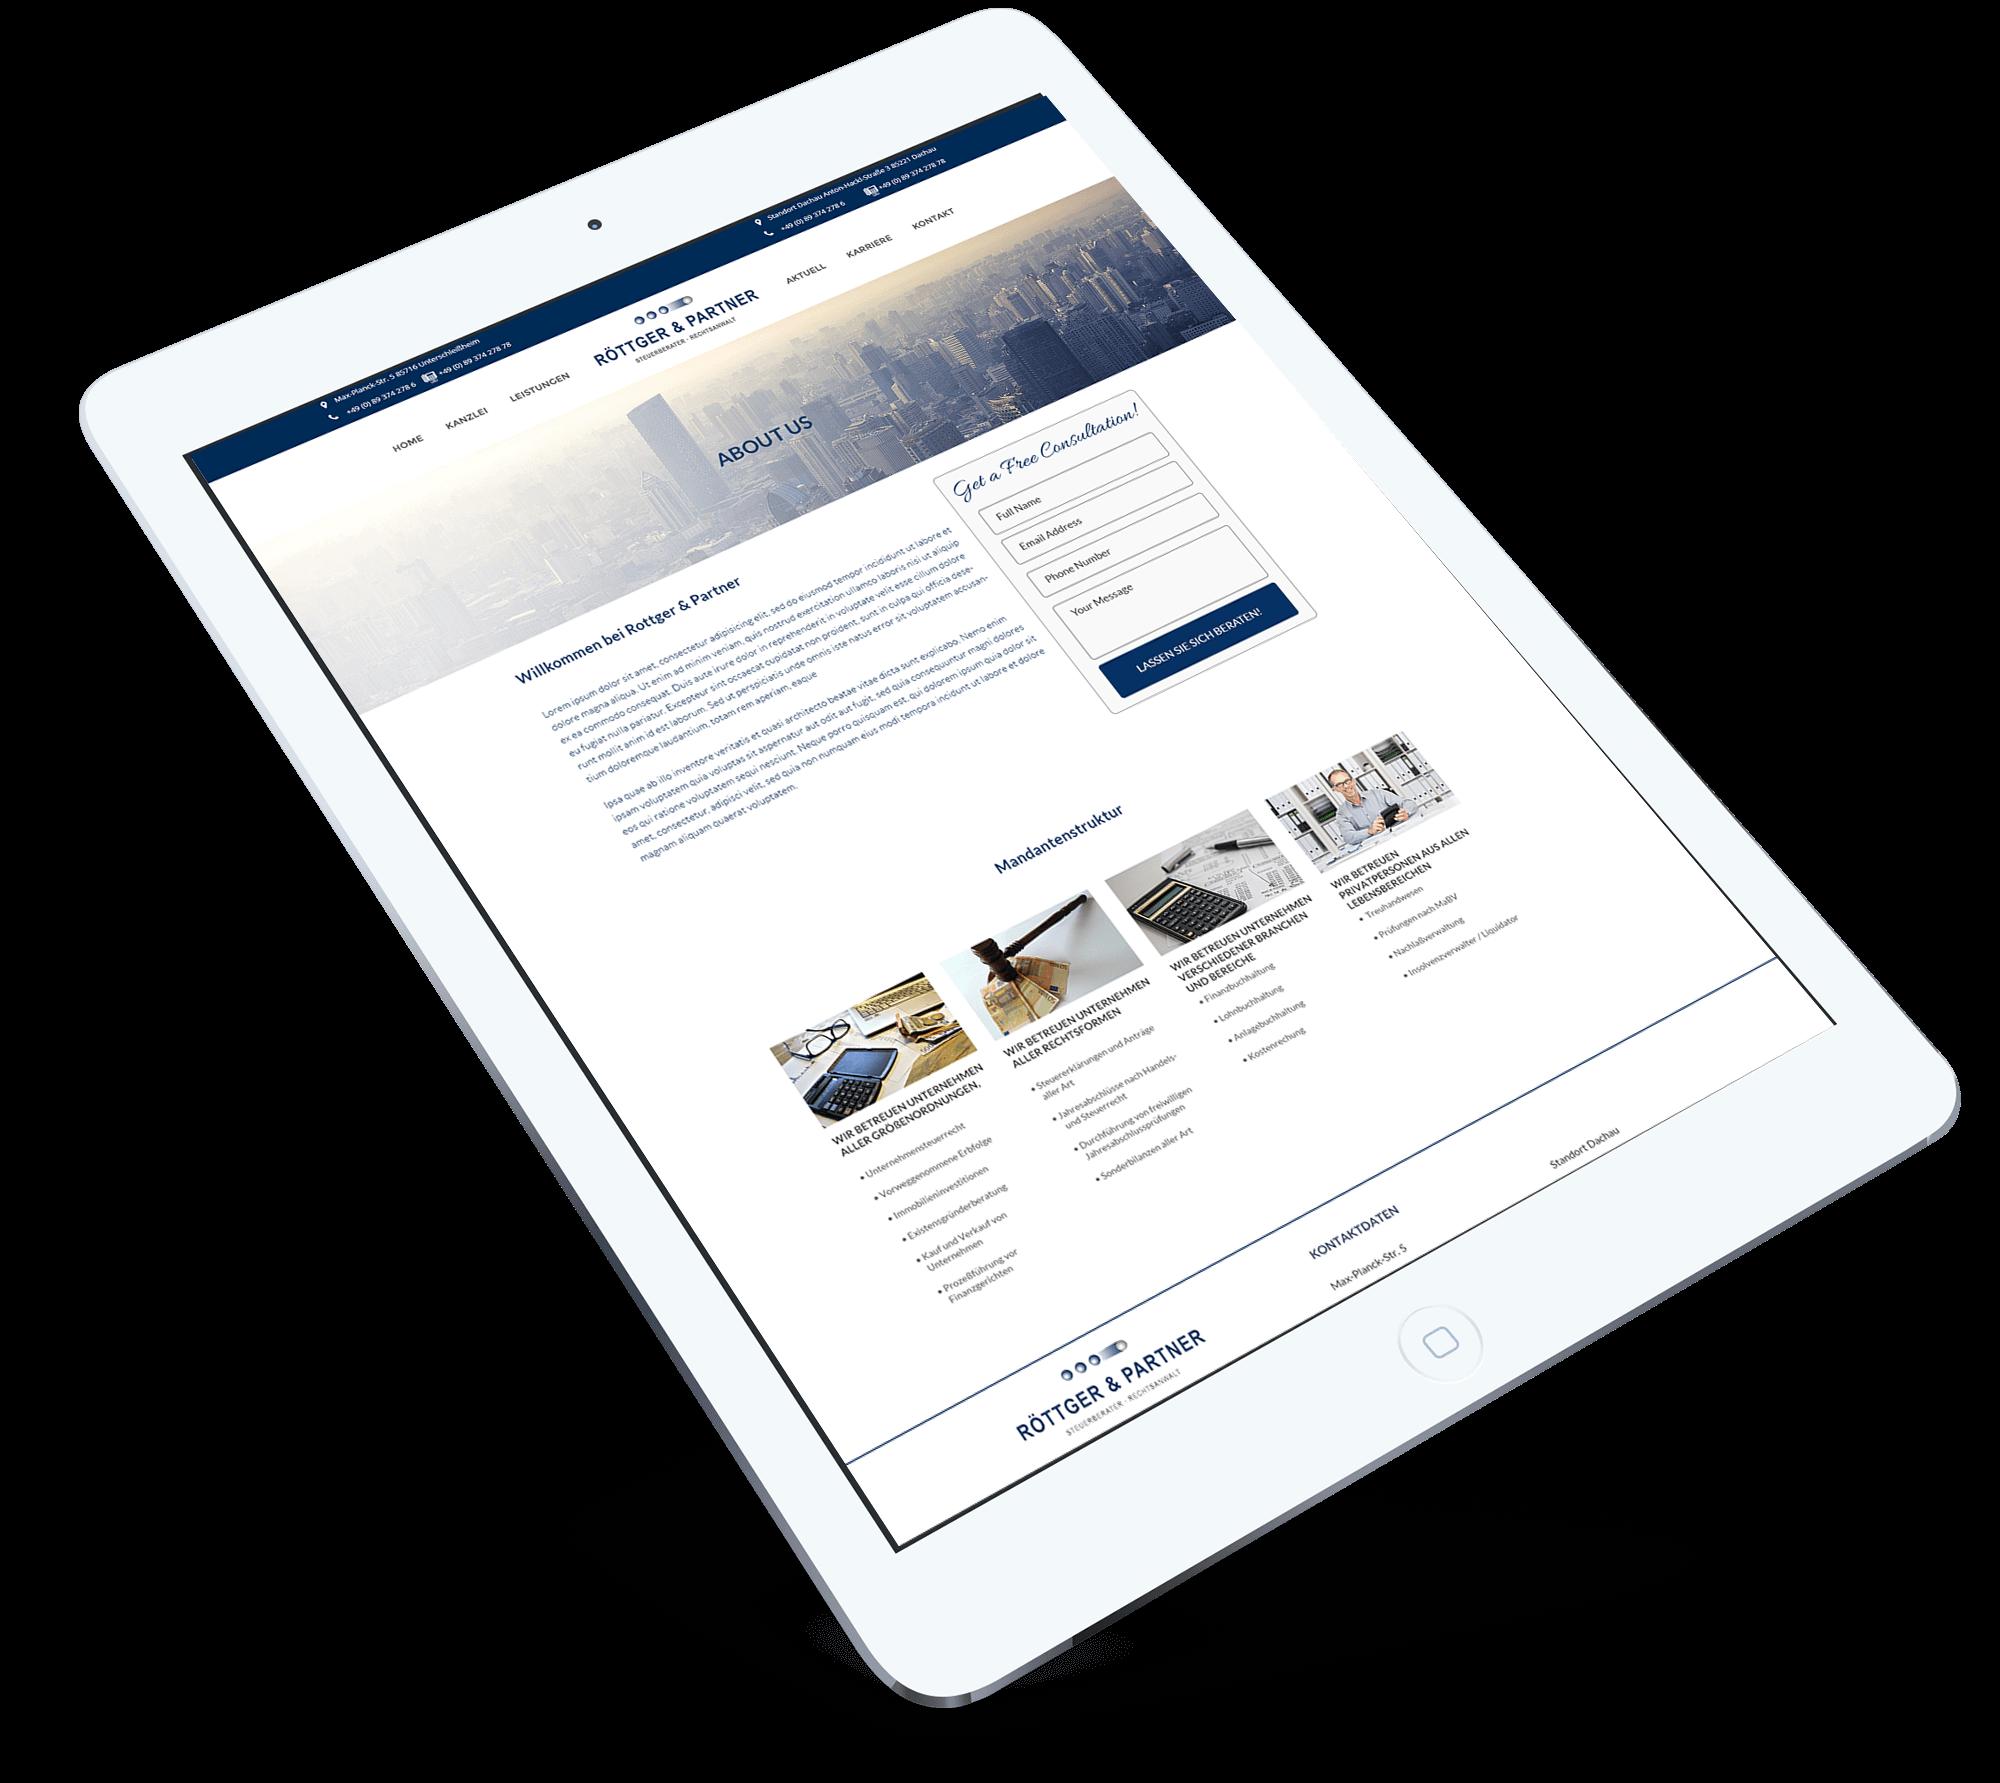 Rottger & Partner-BrandCrock-portfolio-client structure-ipad